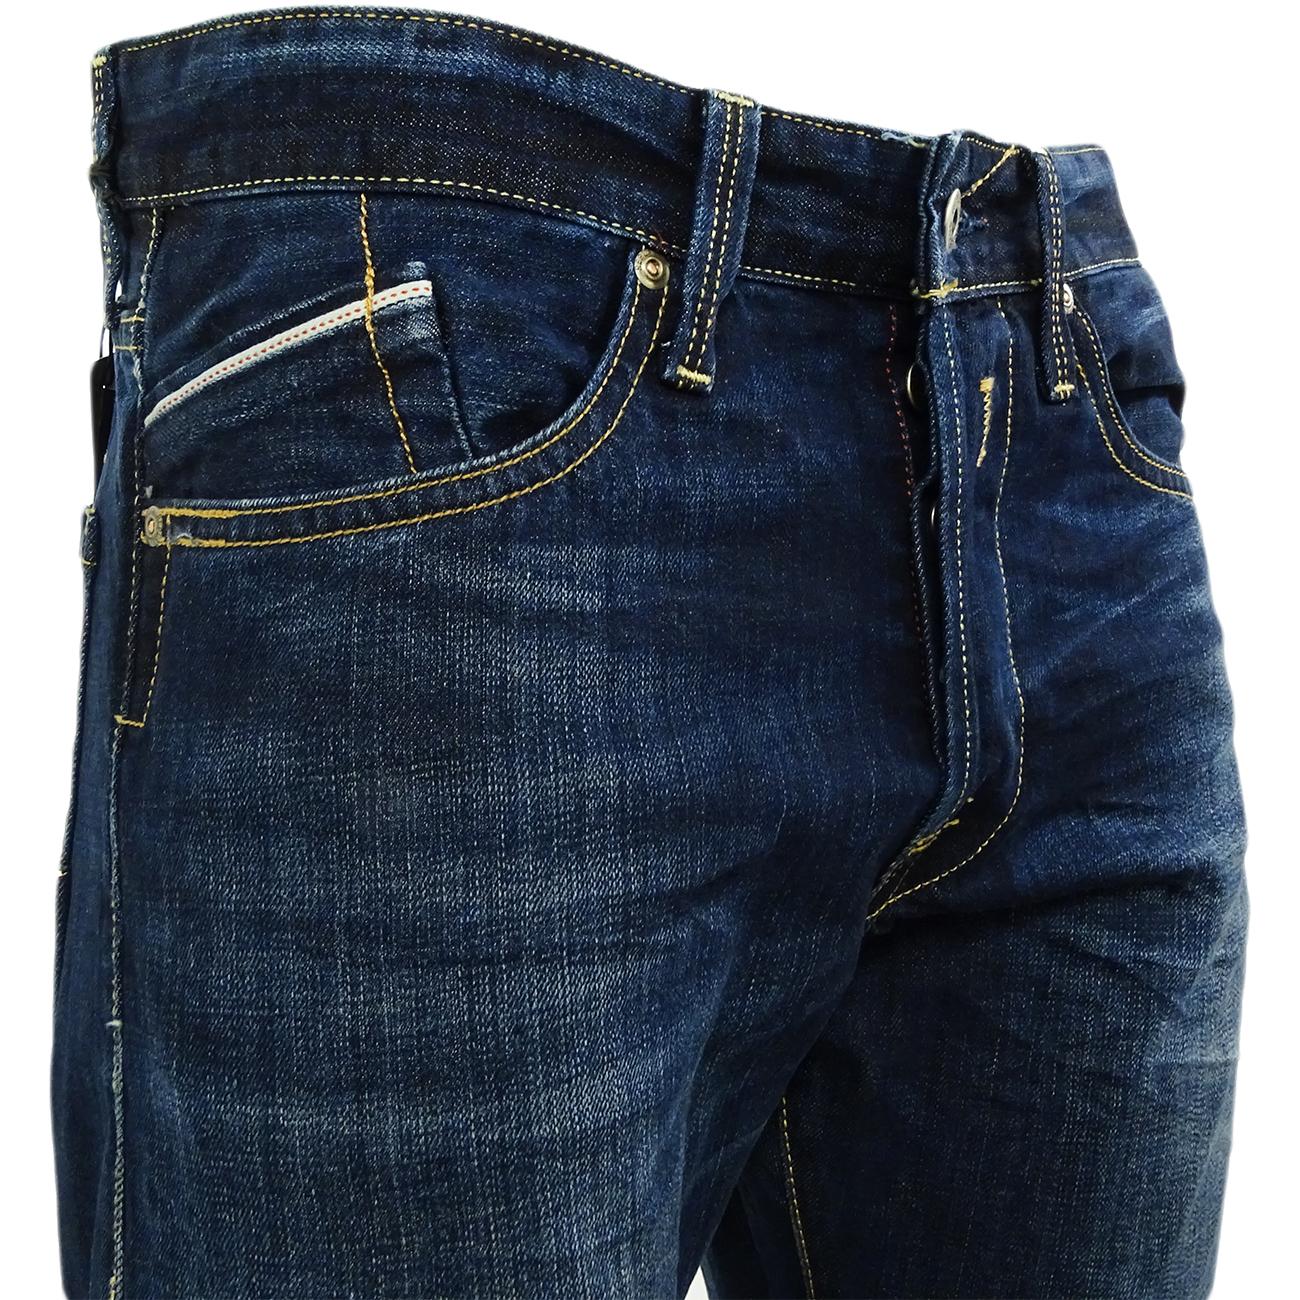 Sentinel Mens Replay Dark Blue Jean - Waitom  Regular Slim Fit Denim Jeans  dad2571878da